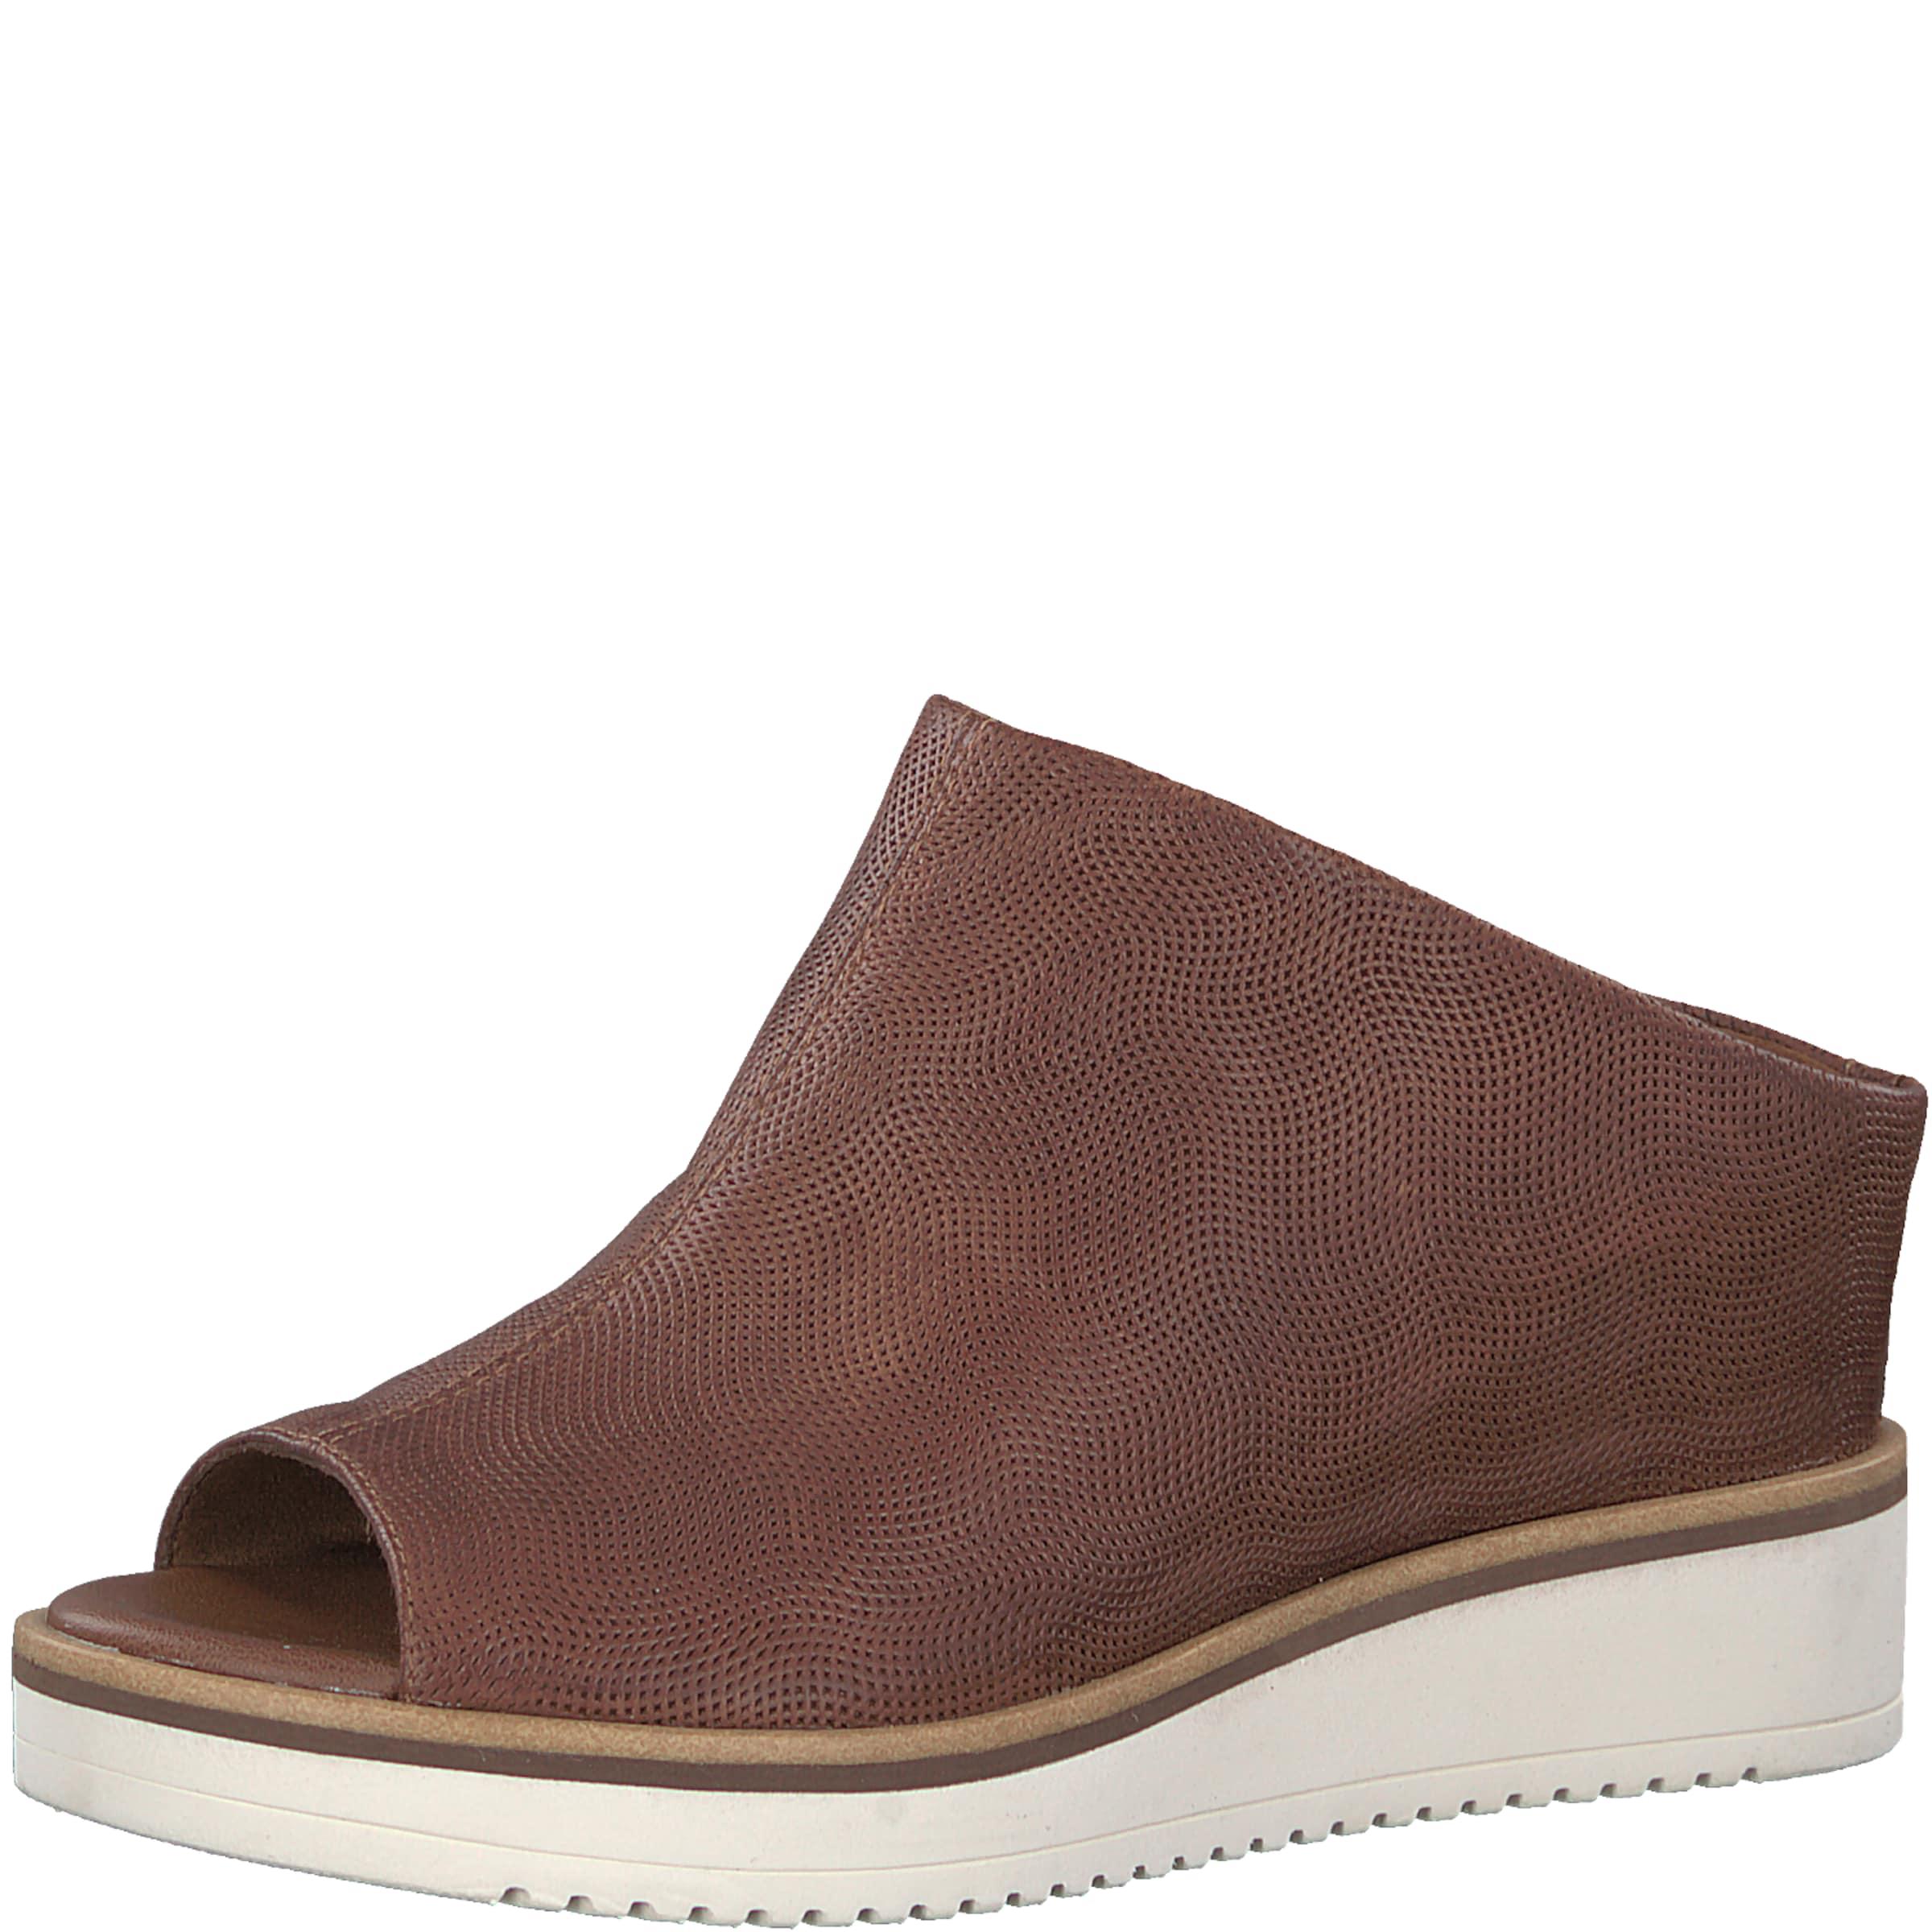 Haltbare Mode billige Schuhe TAMARIS   Wedges Schuhe Gut getragene Schuhe